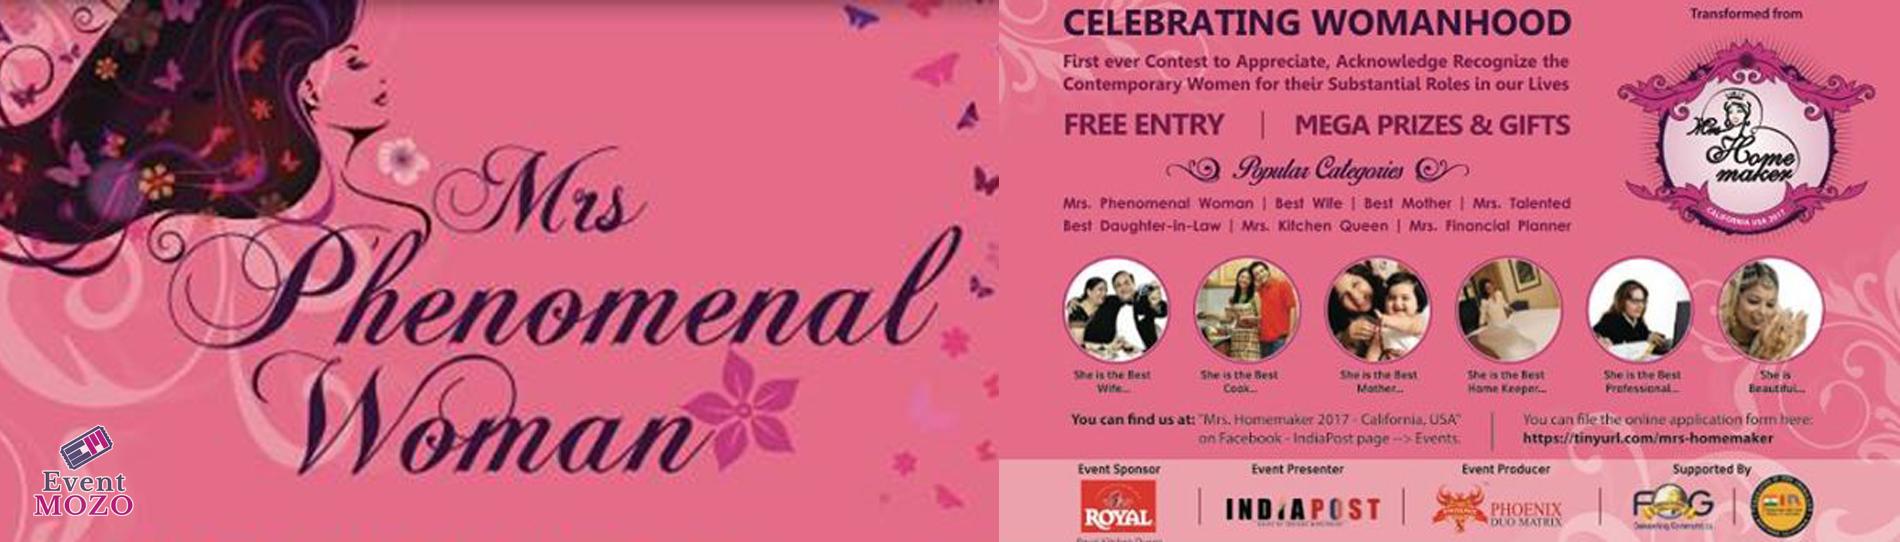 EventMozo Mrs. Phenomenal 2017 - Free Entry